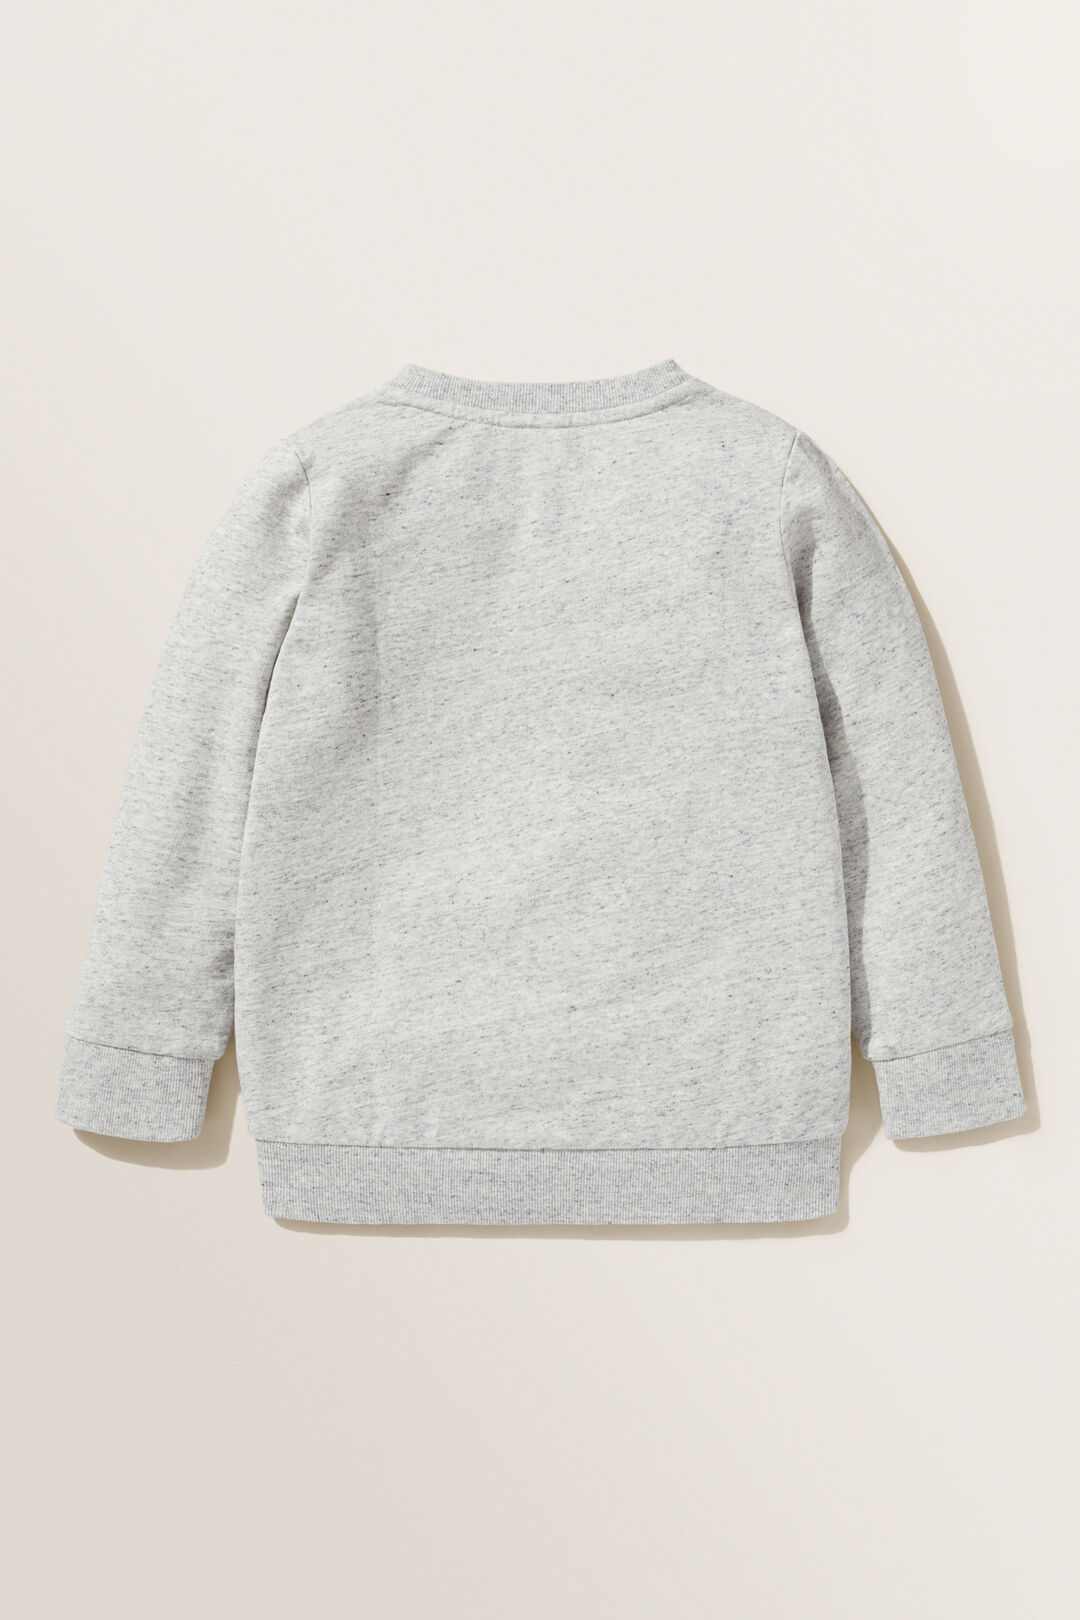 Globe Slogan Sweater  CLOUDY MARLE  hi-res